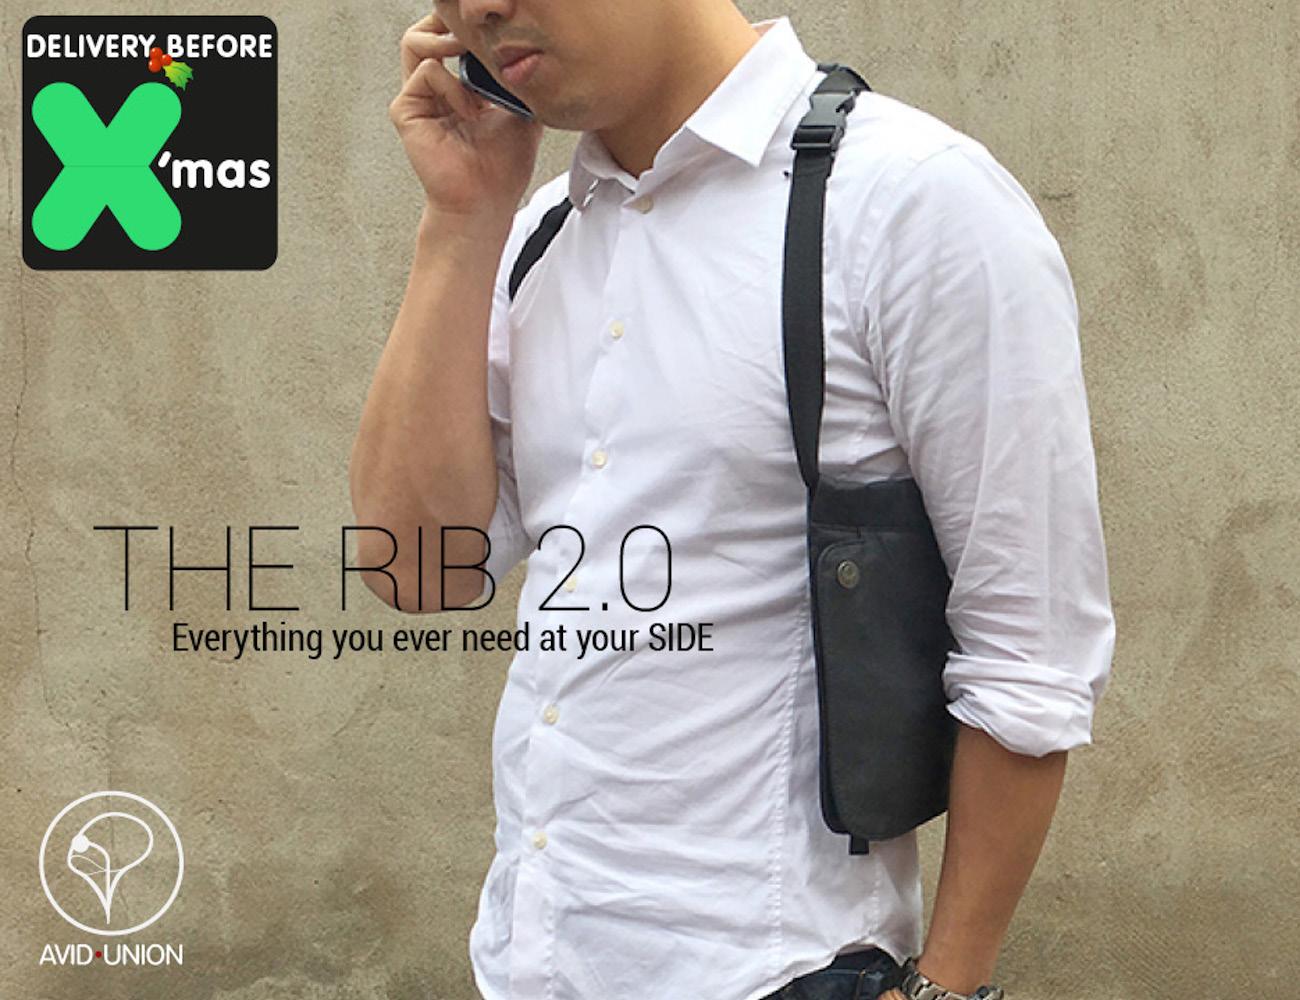 The Rib 2.0